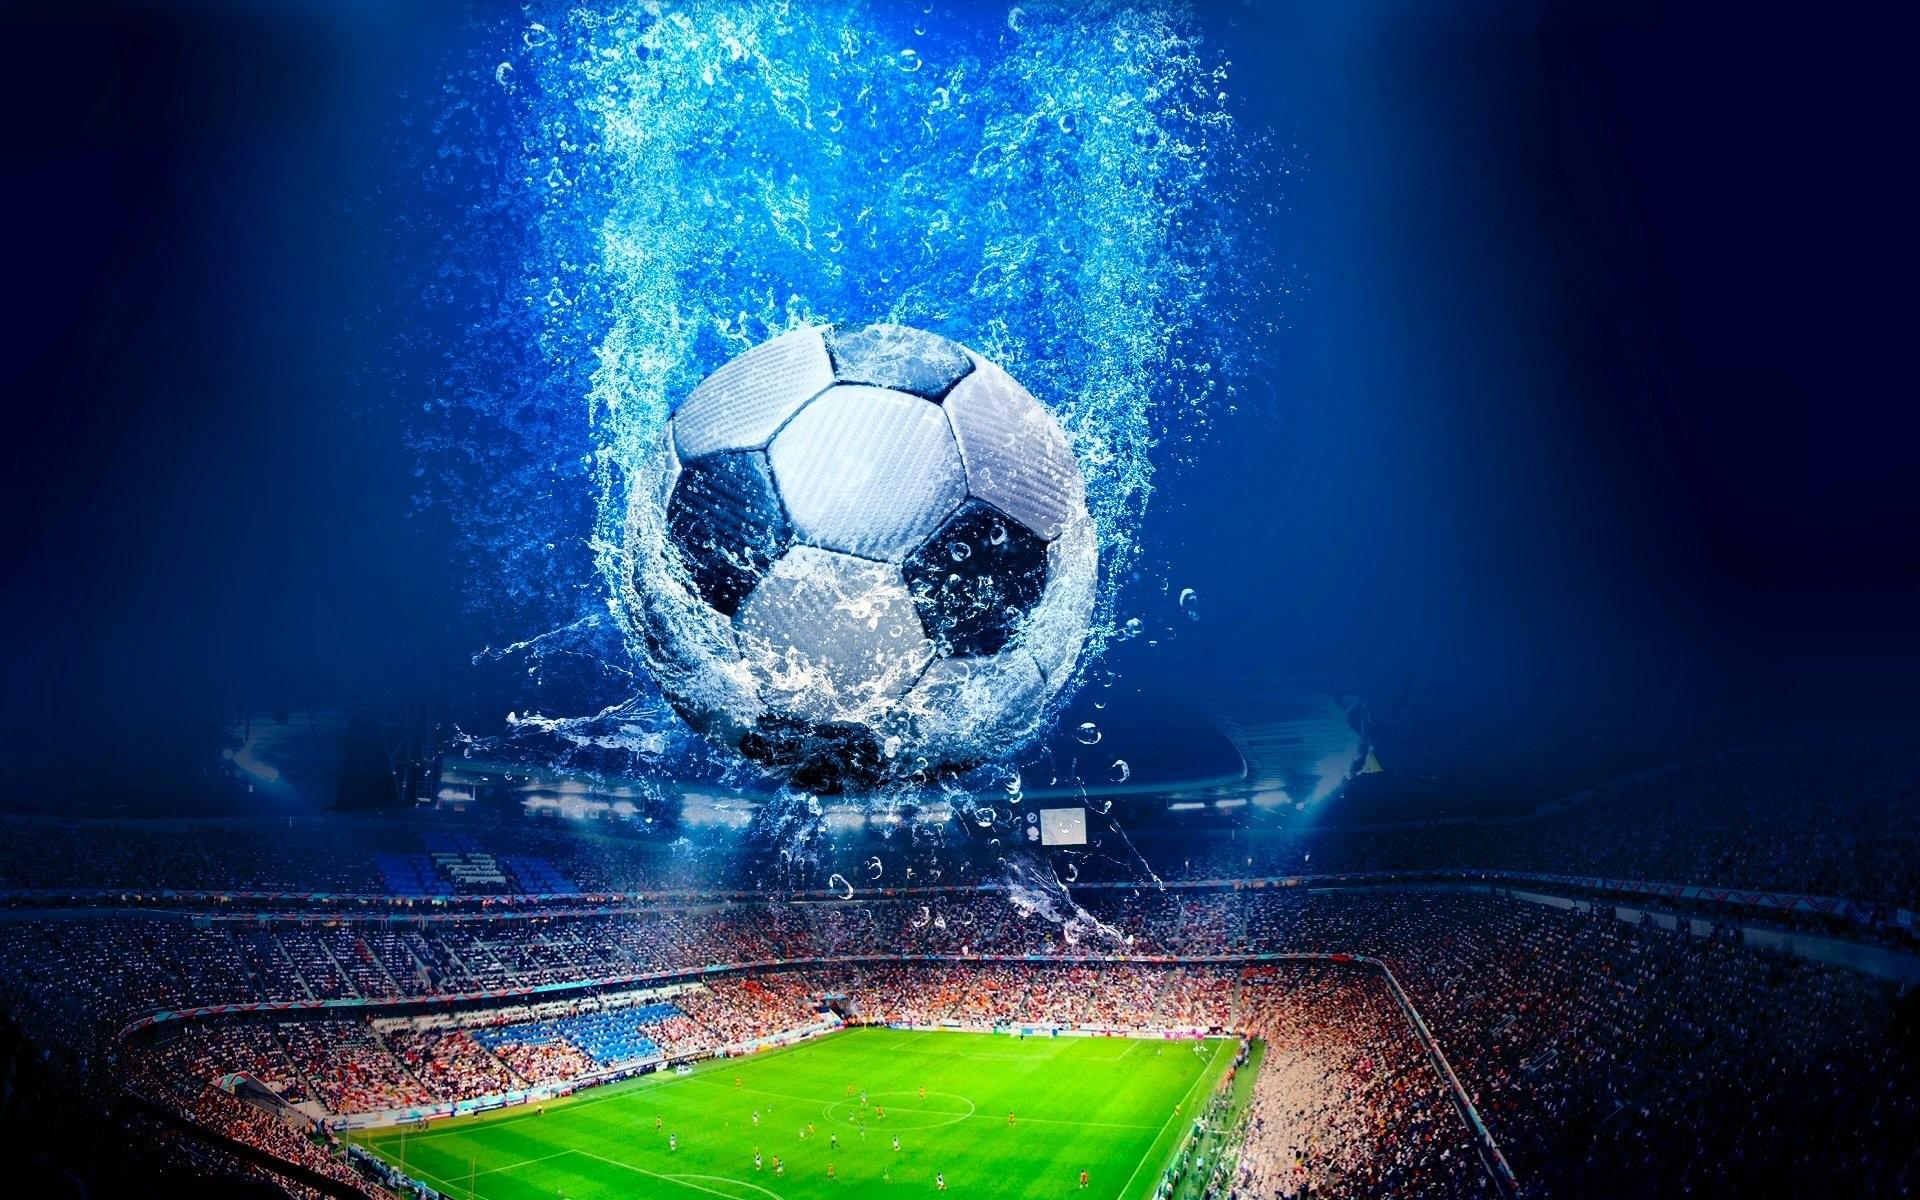 Cool Green Soccer Ball Wallpapers: Cool Soccer Ball Wallpaper (63+ Images